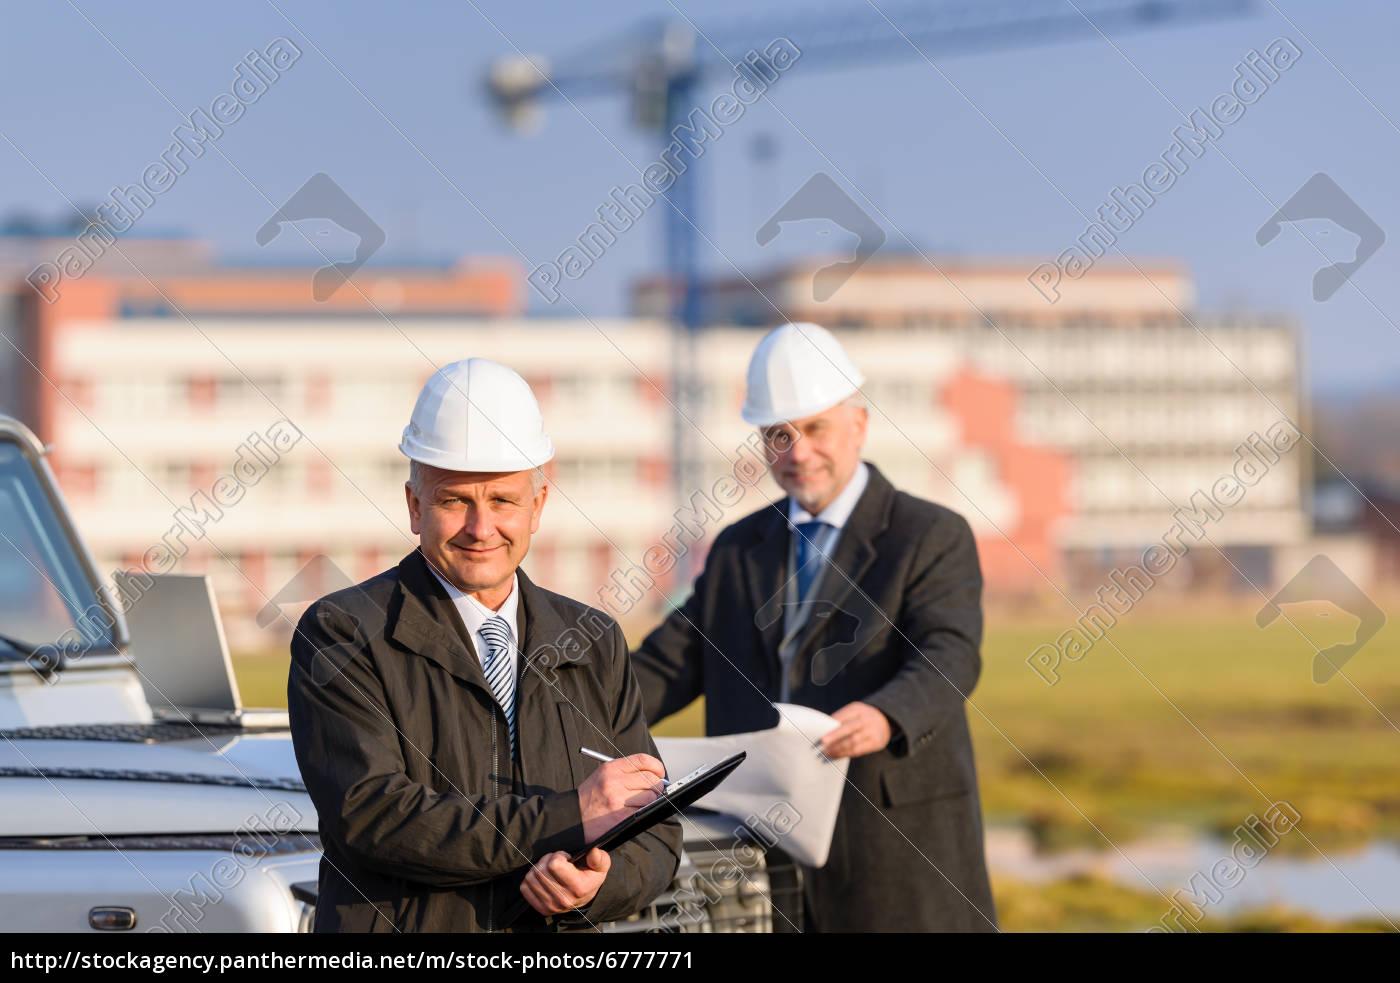 architect, man, make, notes, on, construction - 6777771